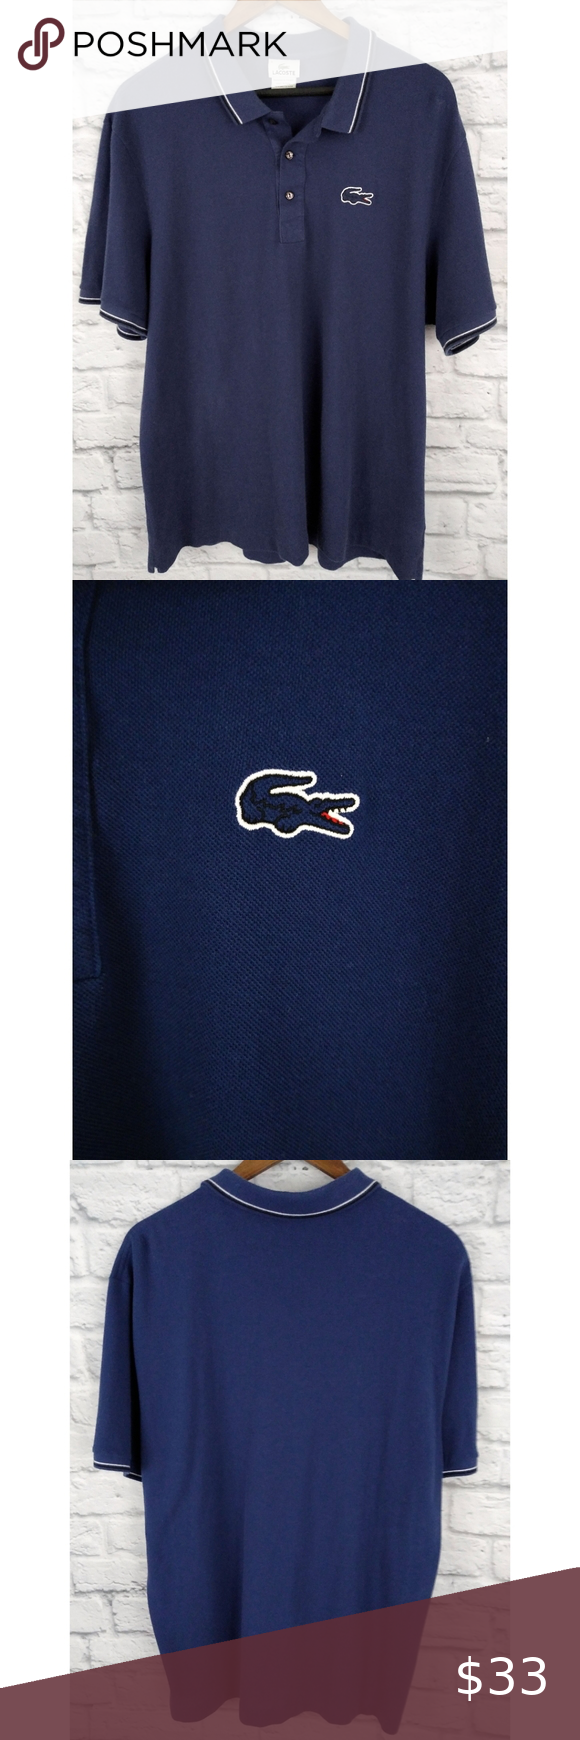 Vintage Lacoste Big Crocodile Polo Shirt Navy L Clothes Design Lacoste Polo Shirts Lacoste